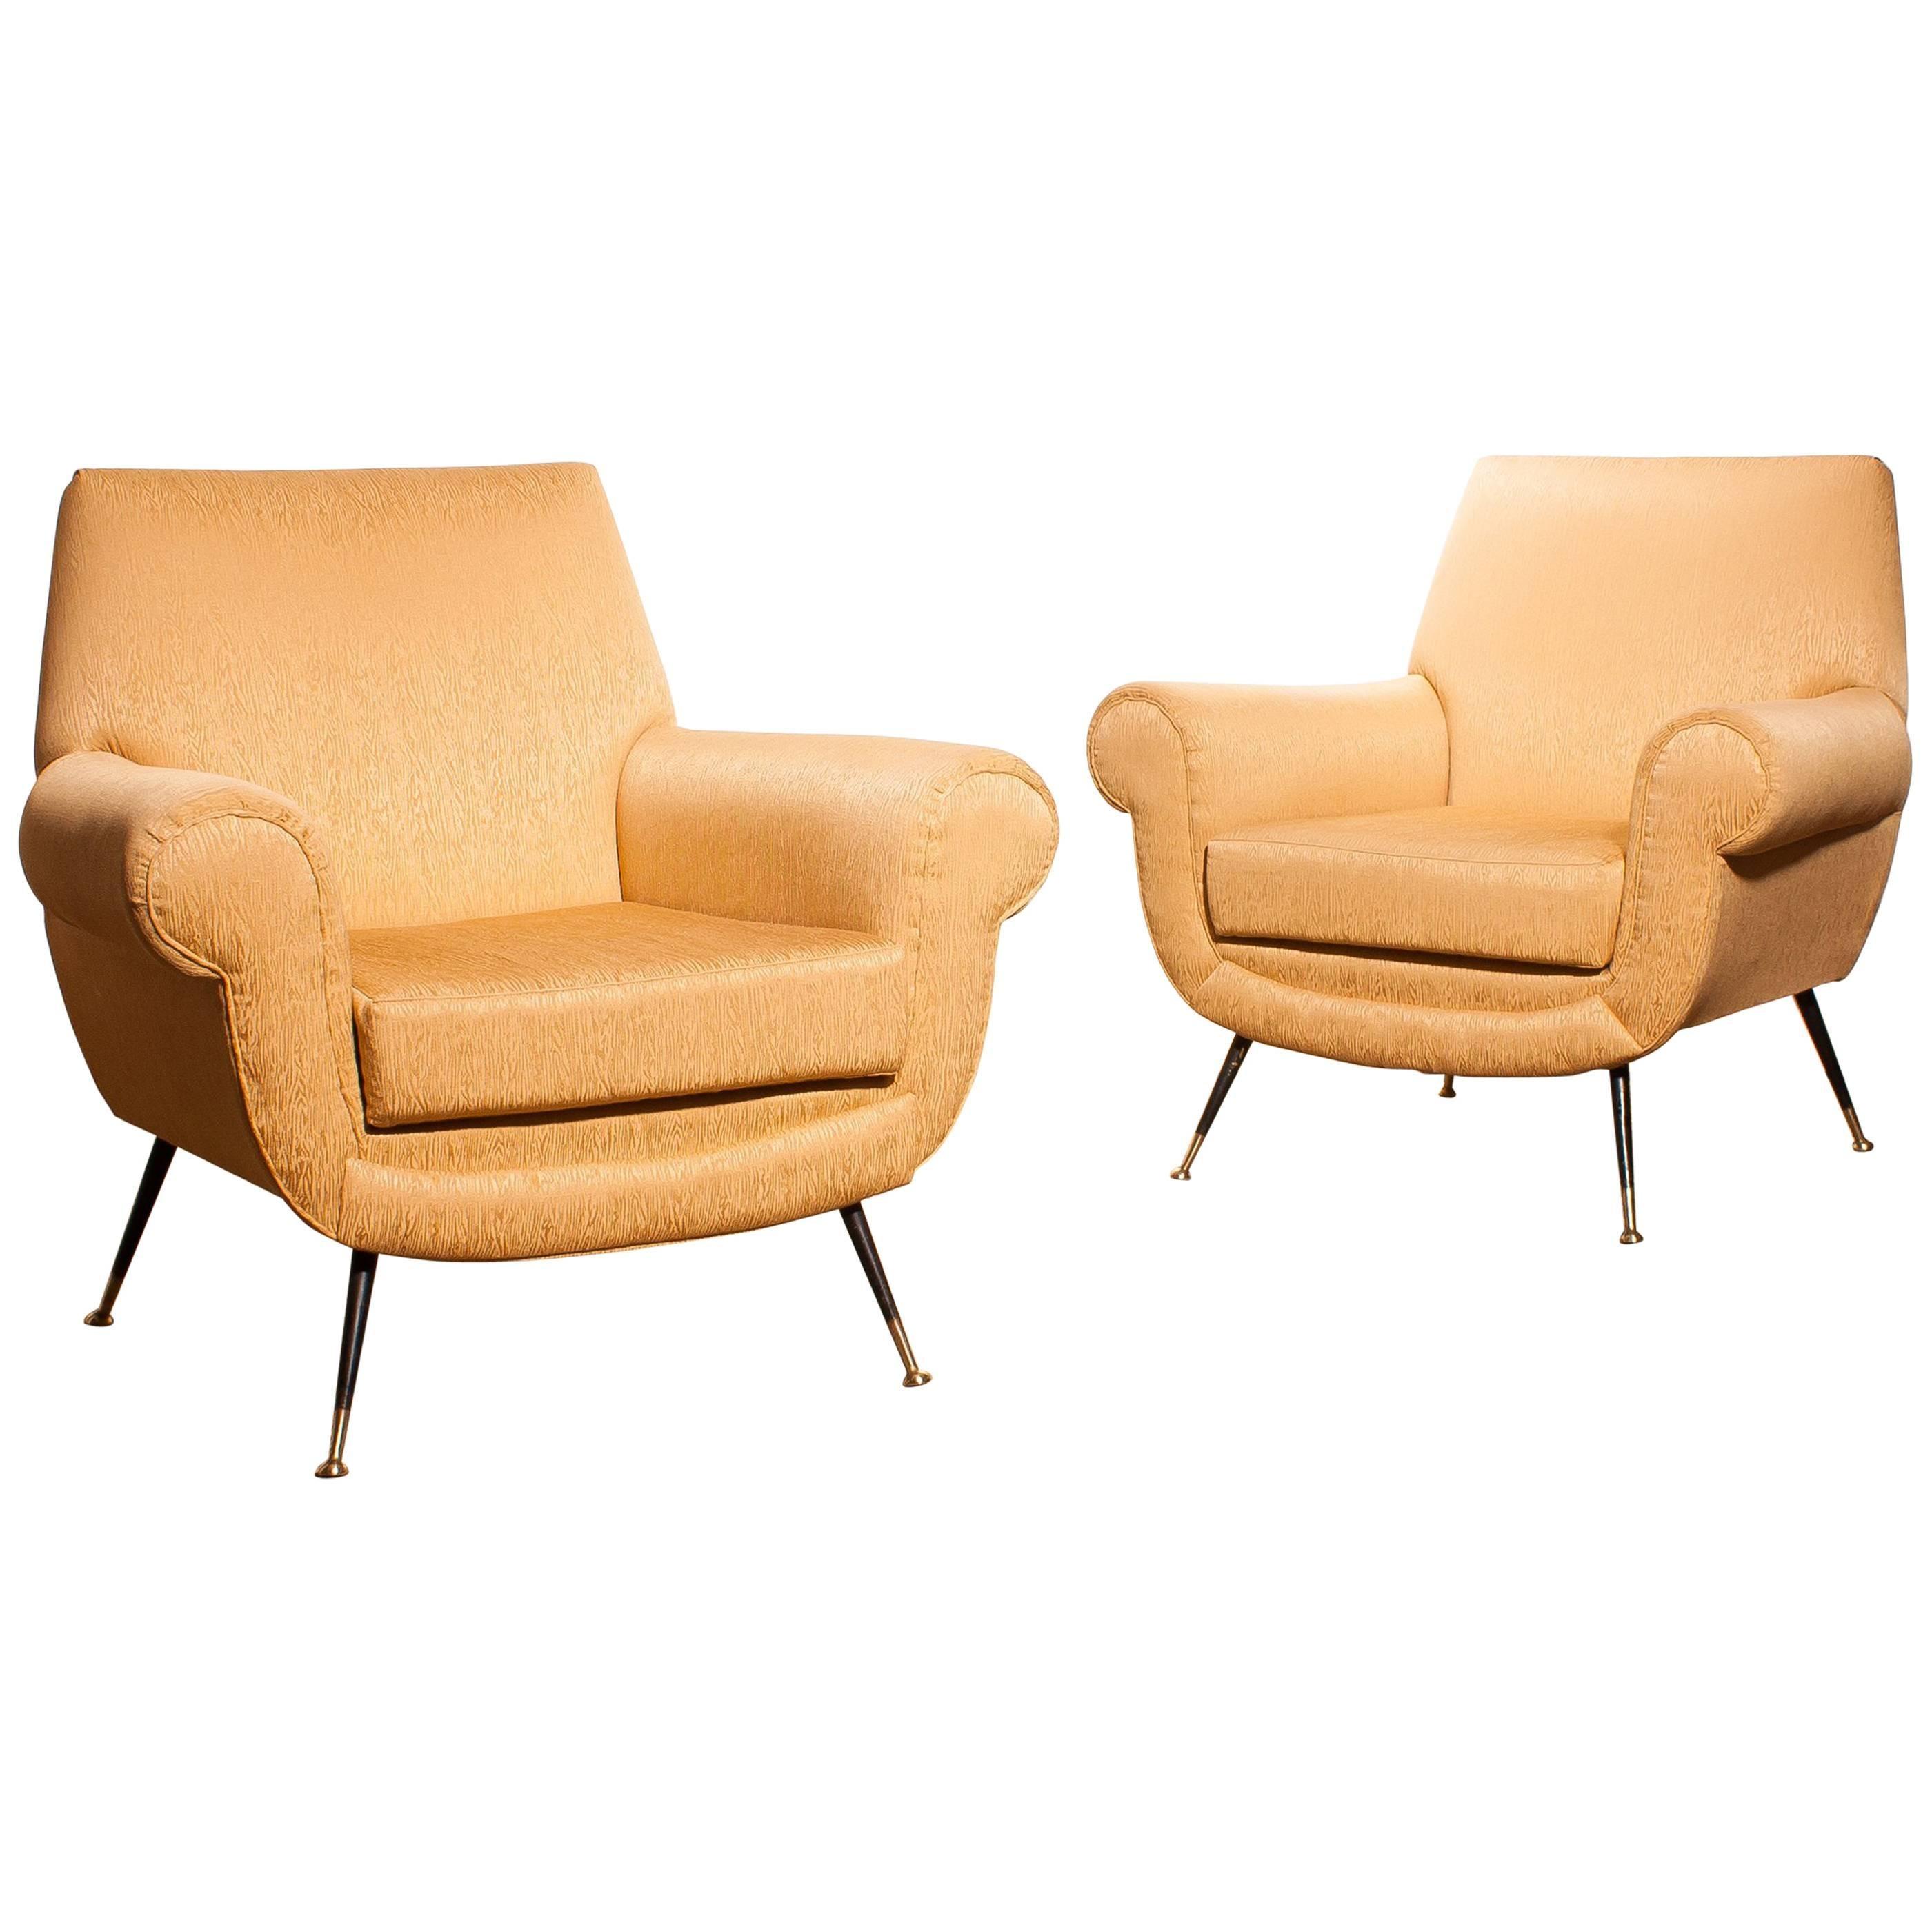 Golden Jacquard Upholstered Easy Chairs By Gigi Radice For Minotti, Brass  Legs. For Sale